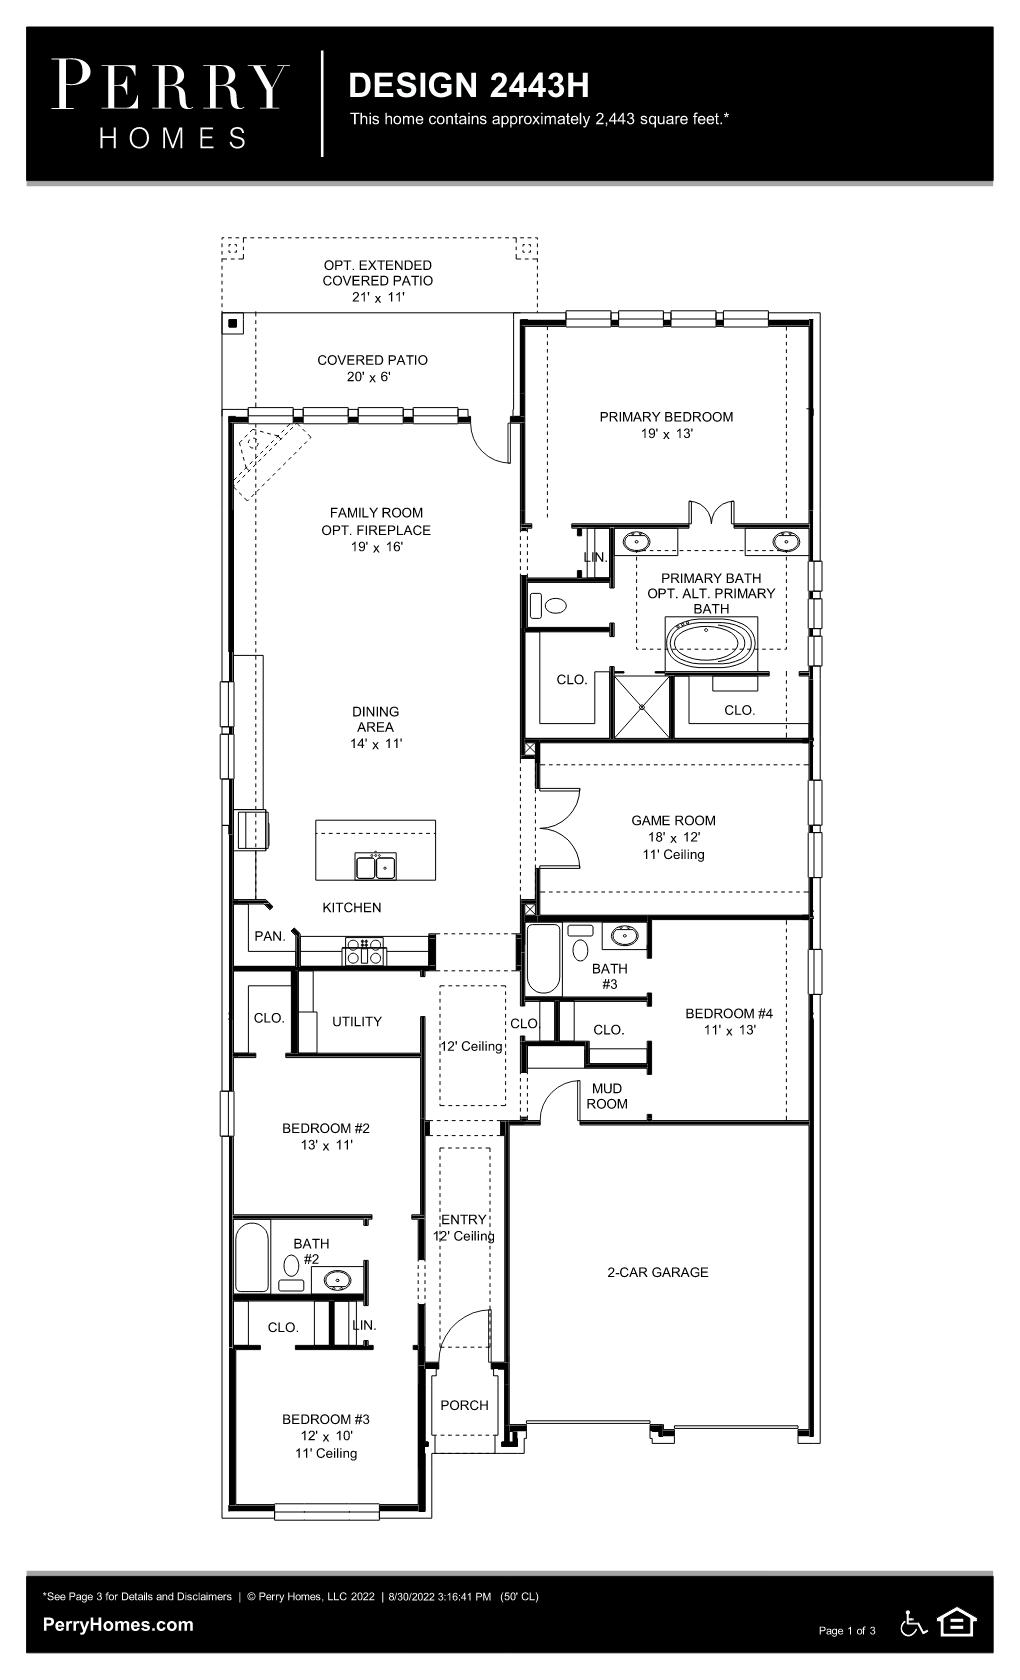 Floor Plan for 2443H